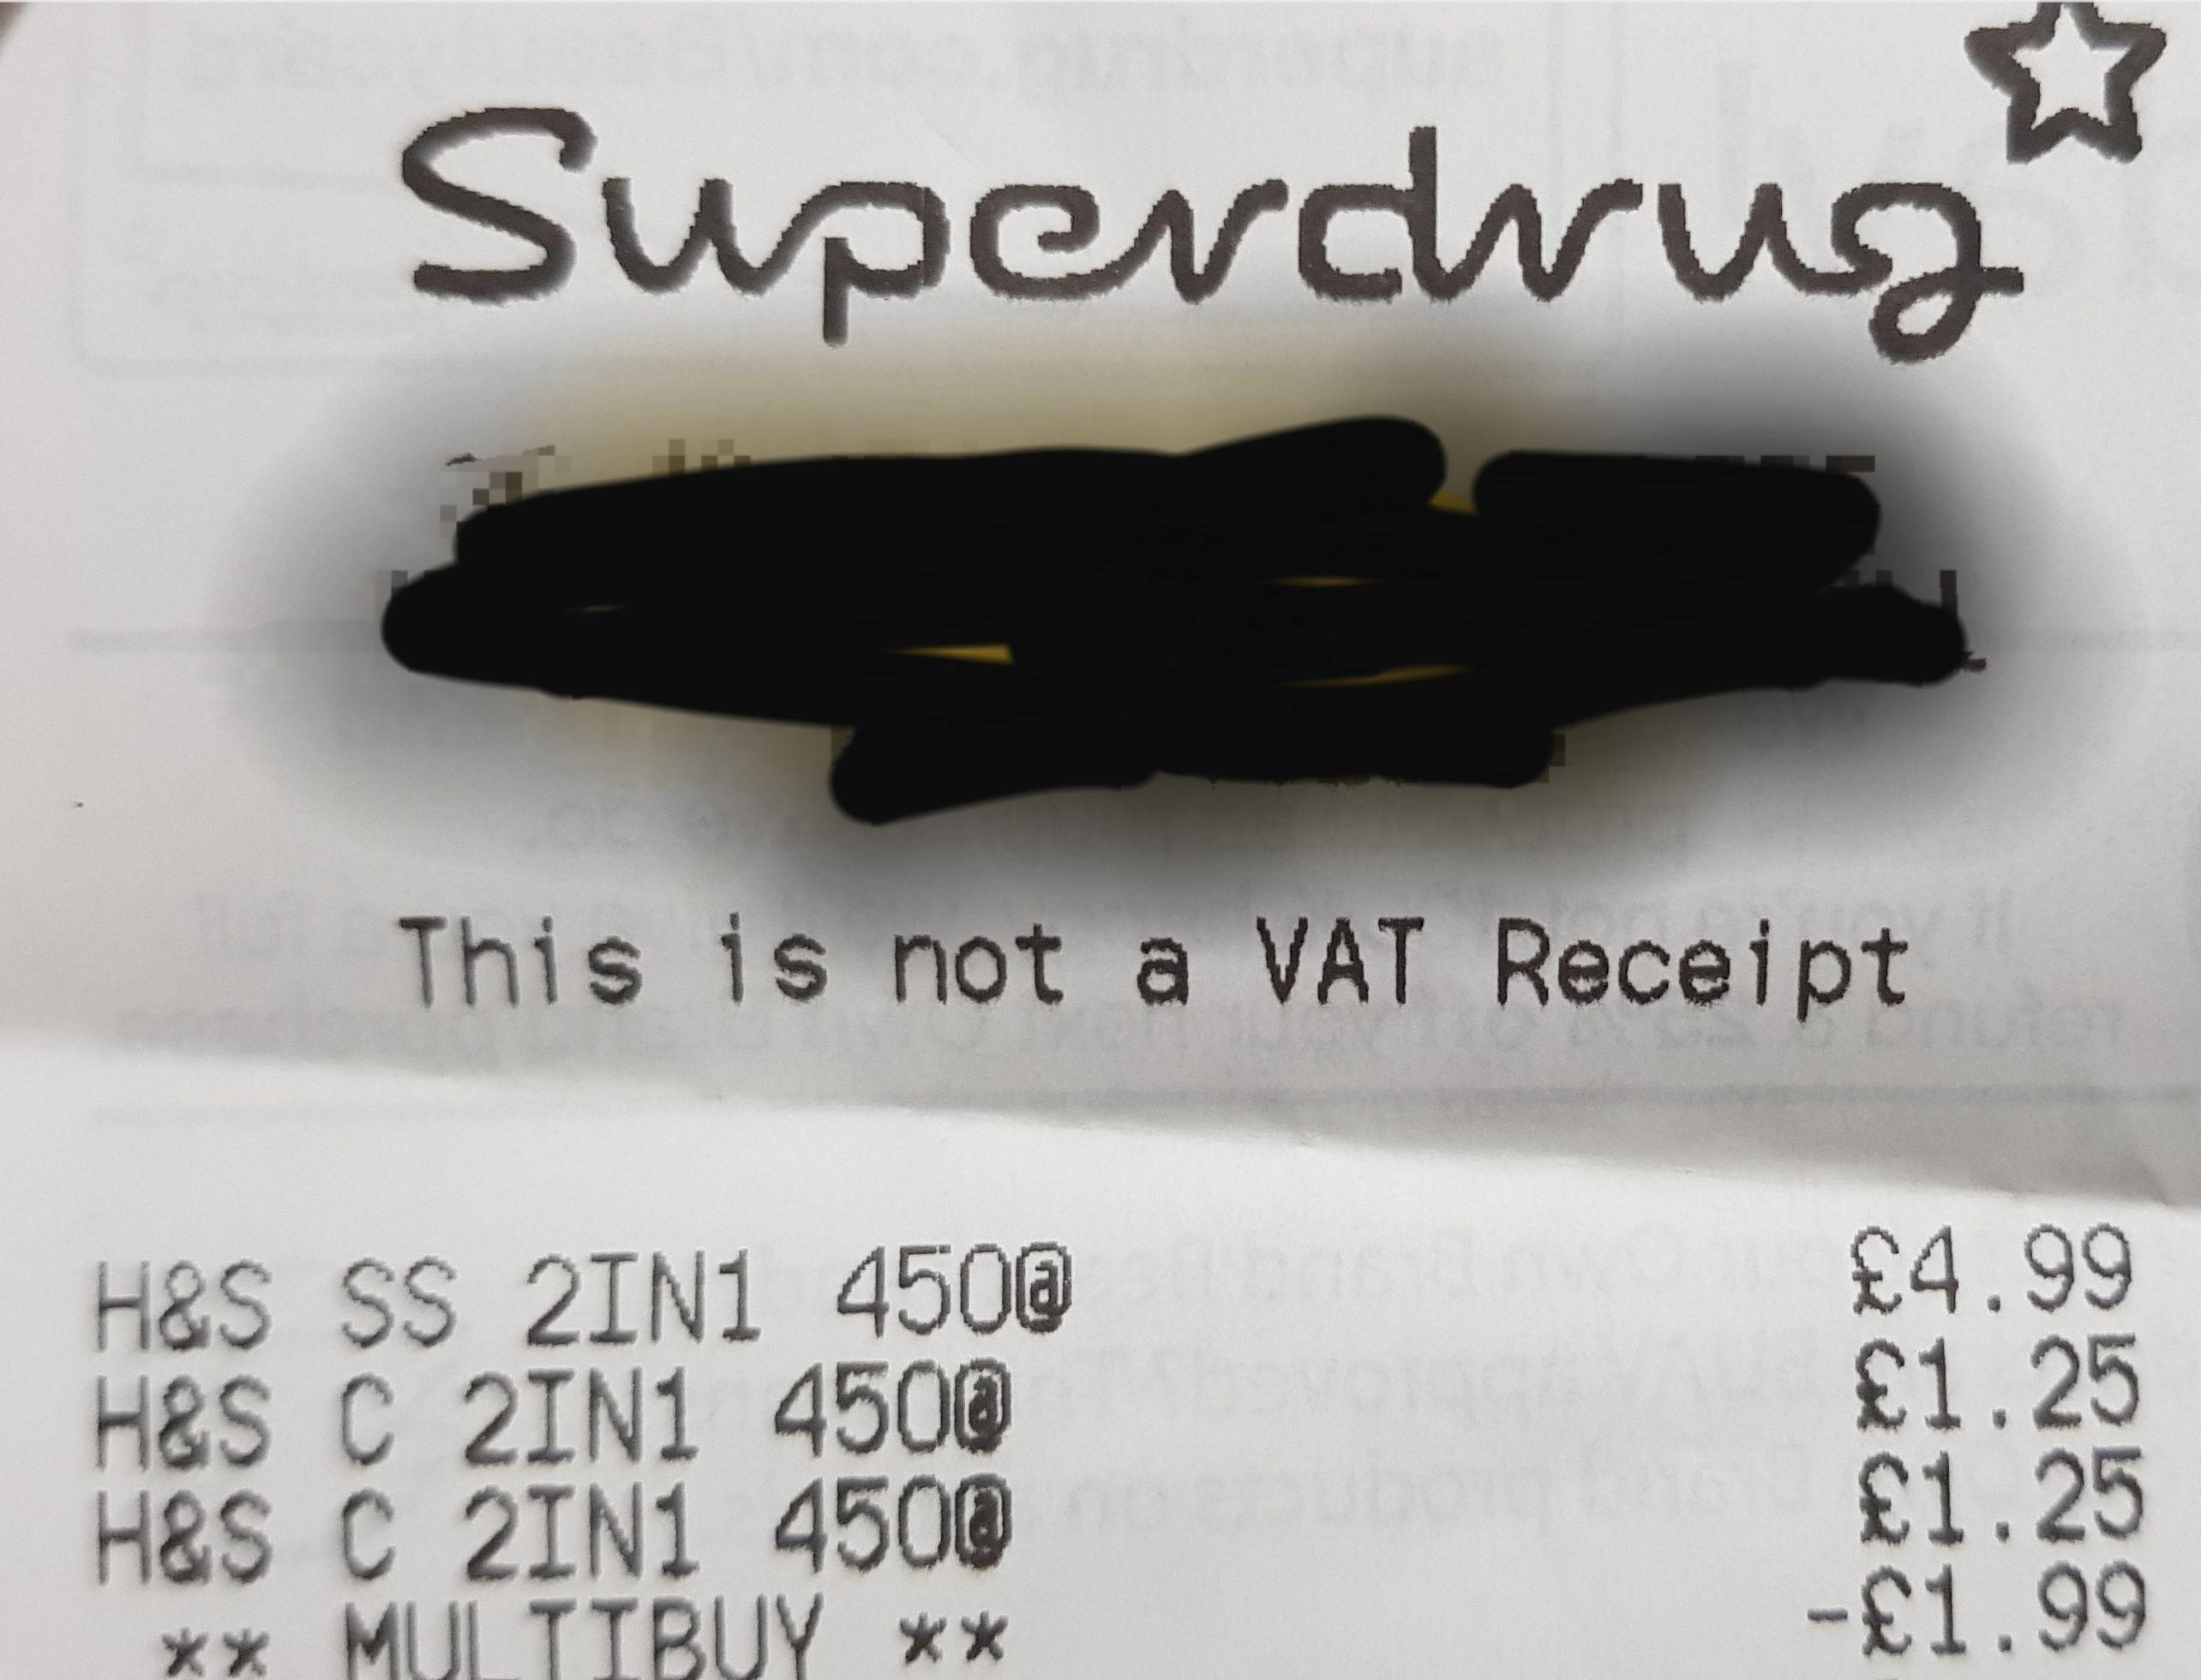 Head and Shoulders Shampoo £1.25 @ Superdrug